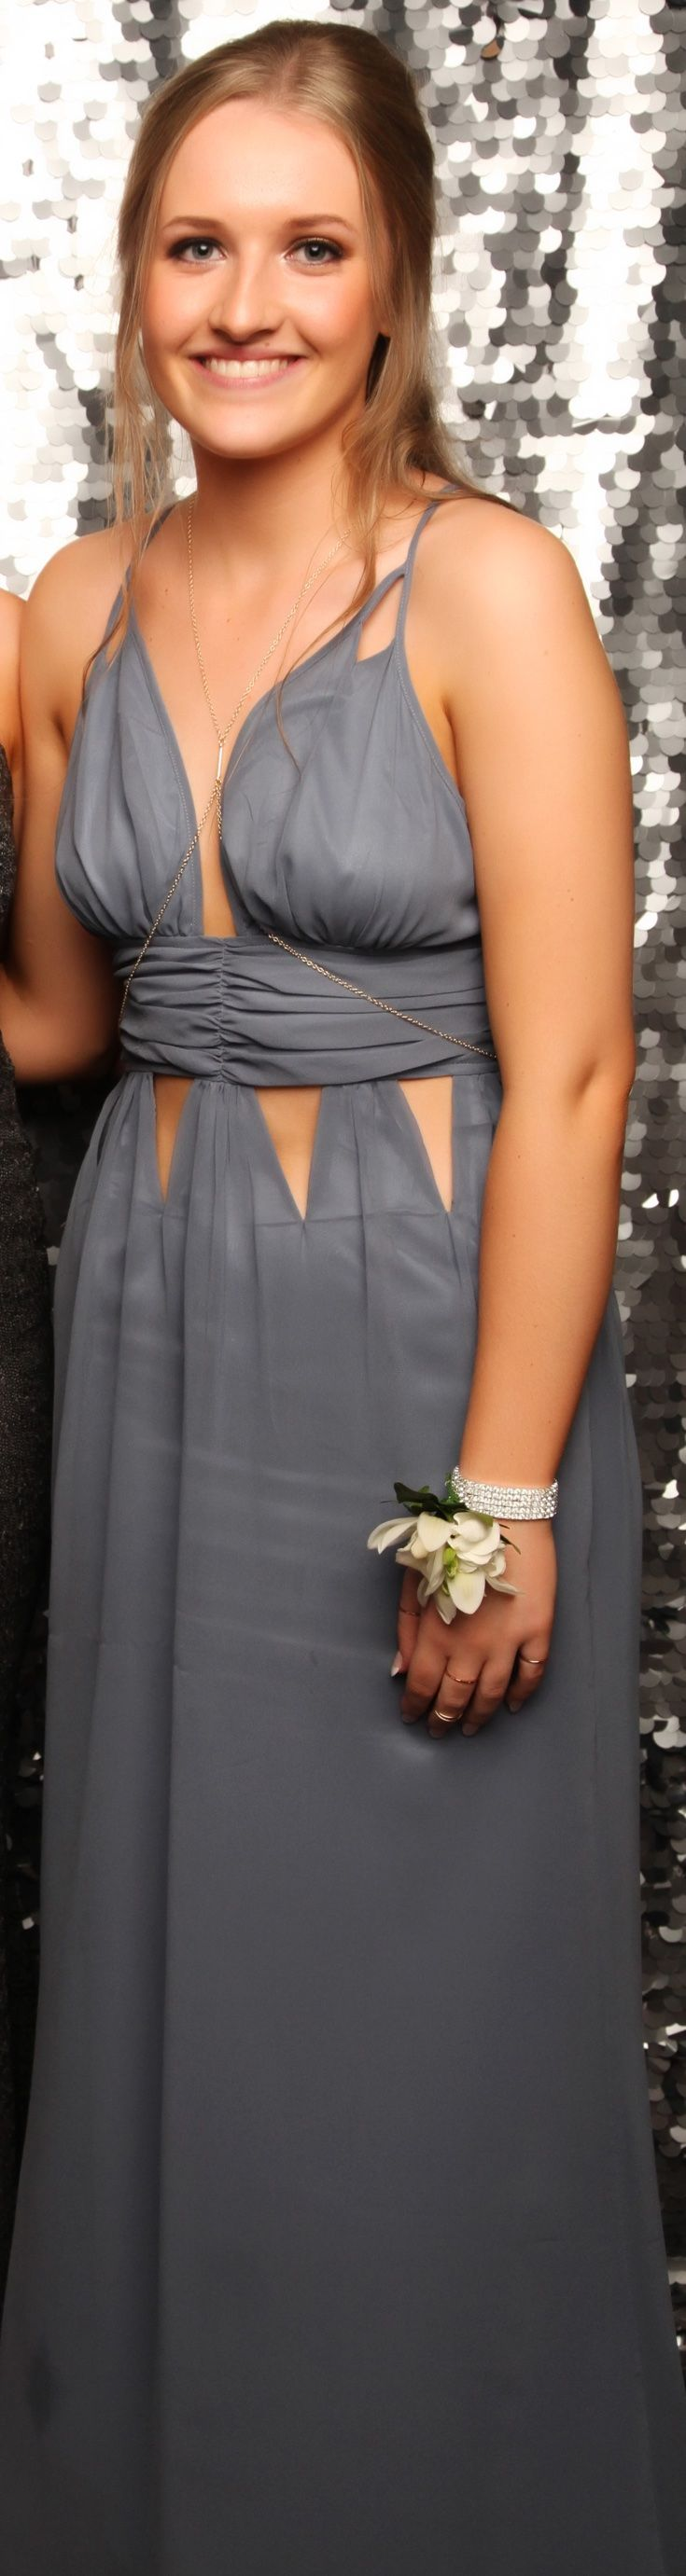 Baradene Ball 2016. Love this unique gown! www.whitedoor.co.nz